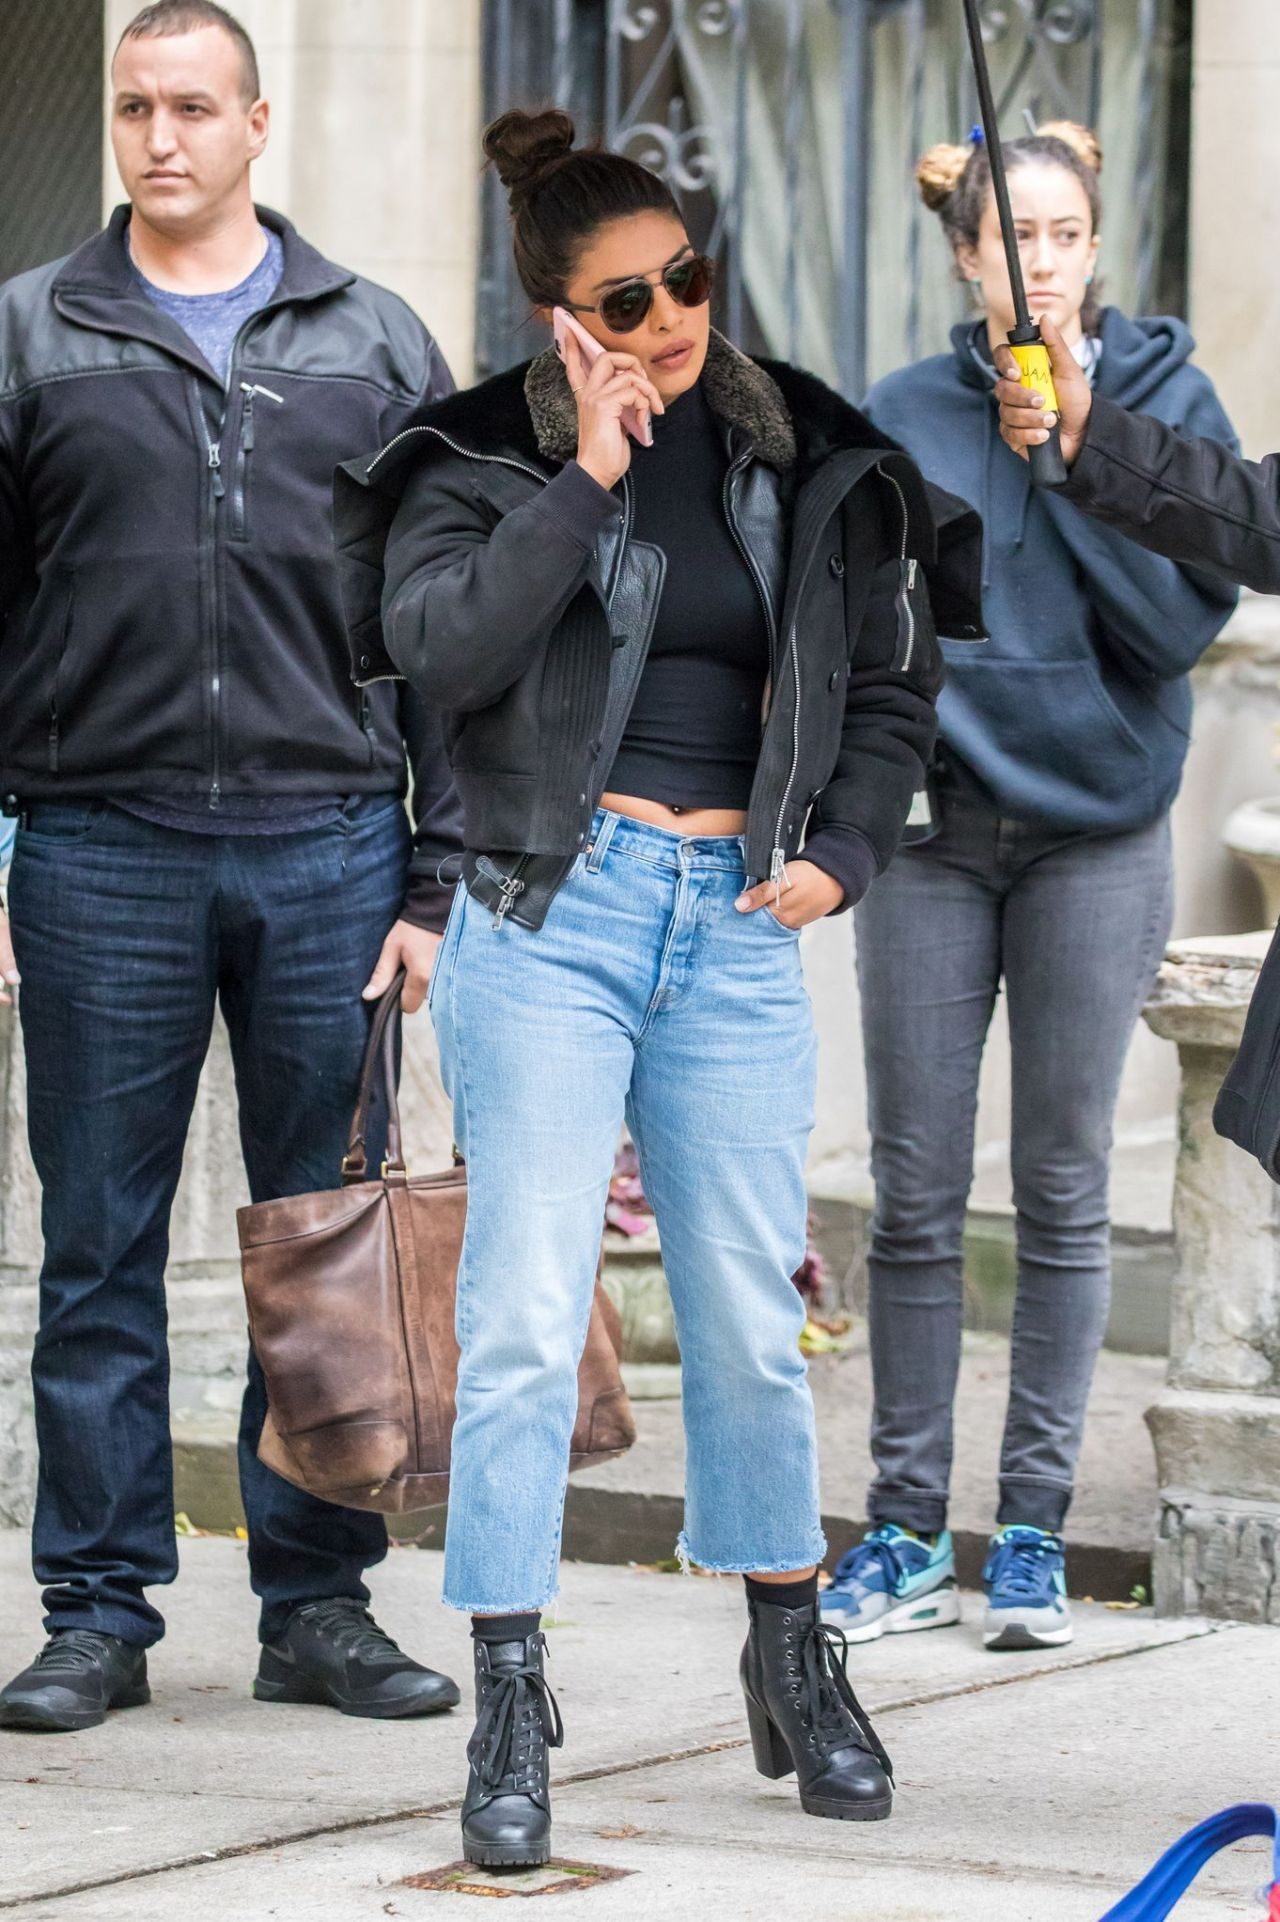 Priyanka Chopra - On the Sets of Quantico Season 3 in NYC 10/27/2017